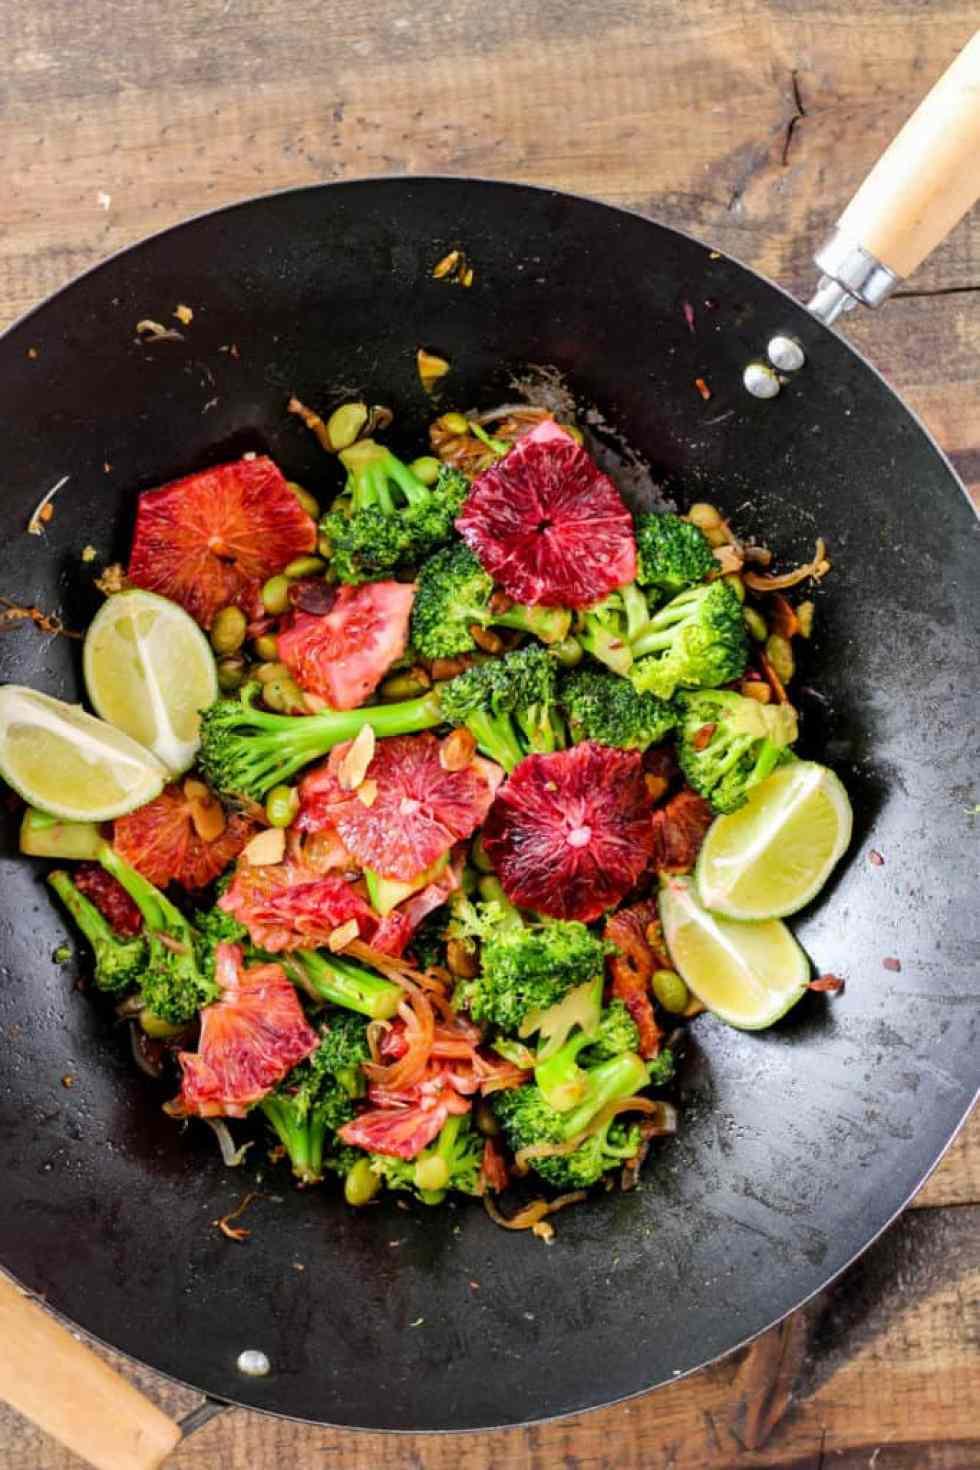 Broccoli Stir-Fry with Blood Oranges in black wok against wood background.